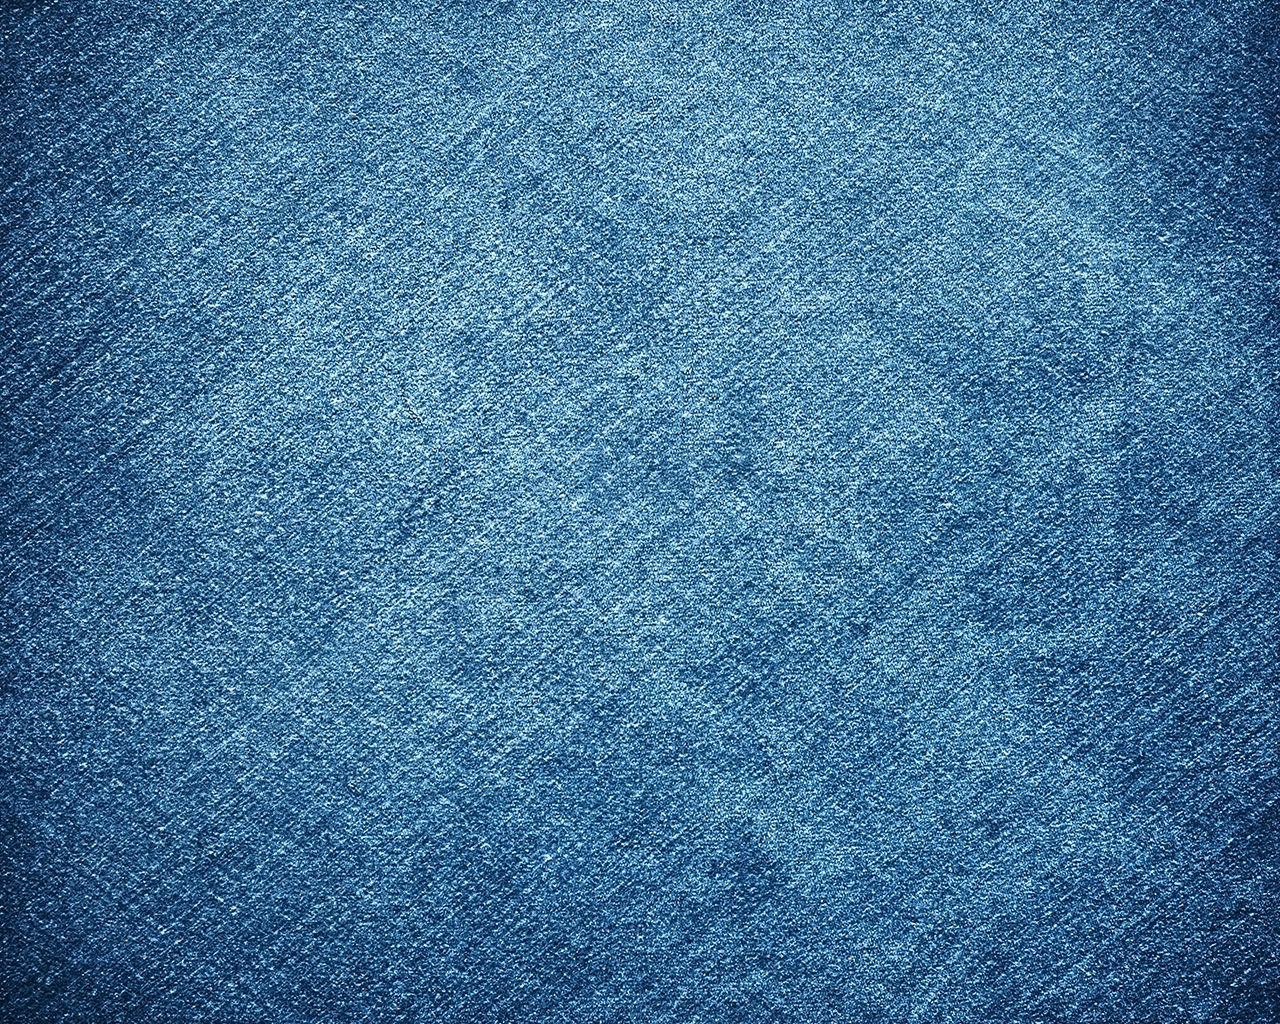 Samsung Galaxy Note 2 Wallpapers Pattern wallpaper